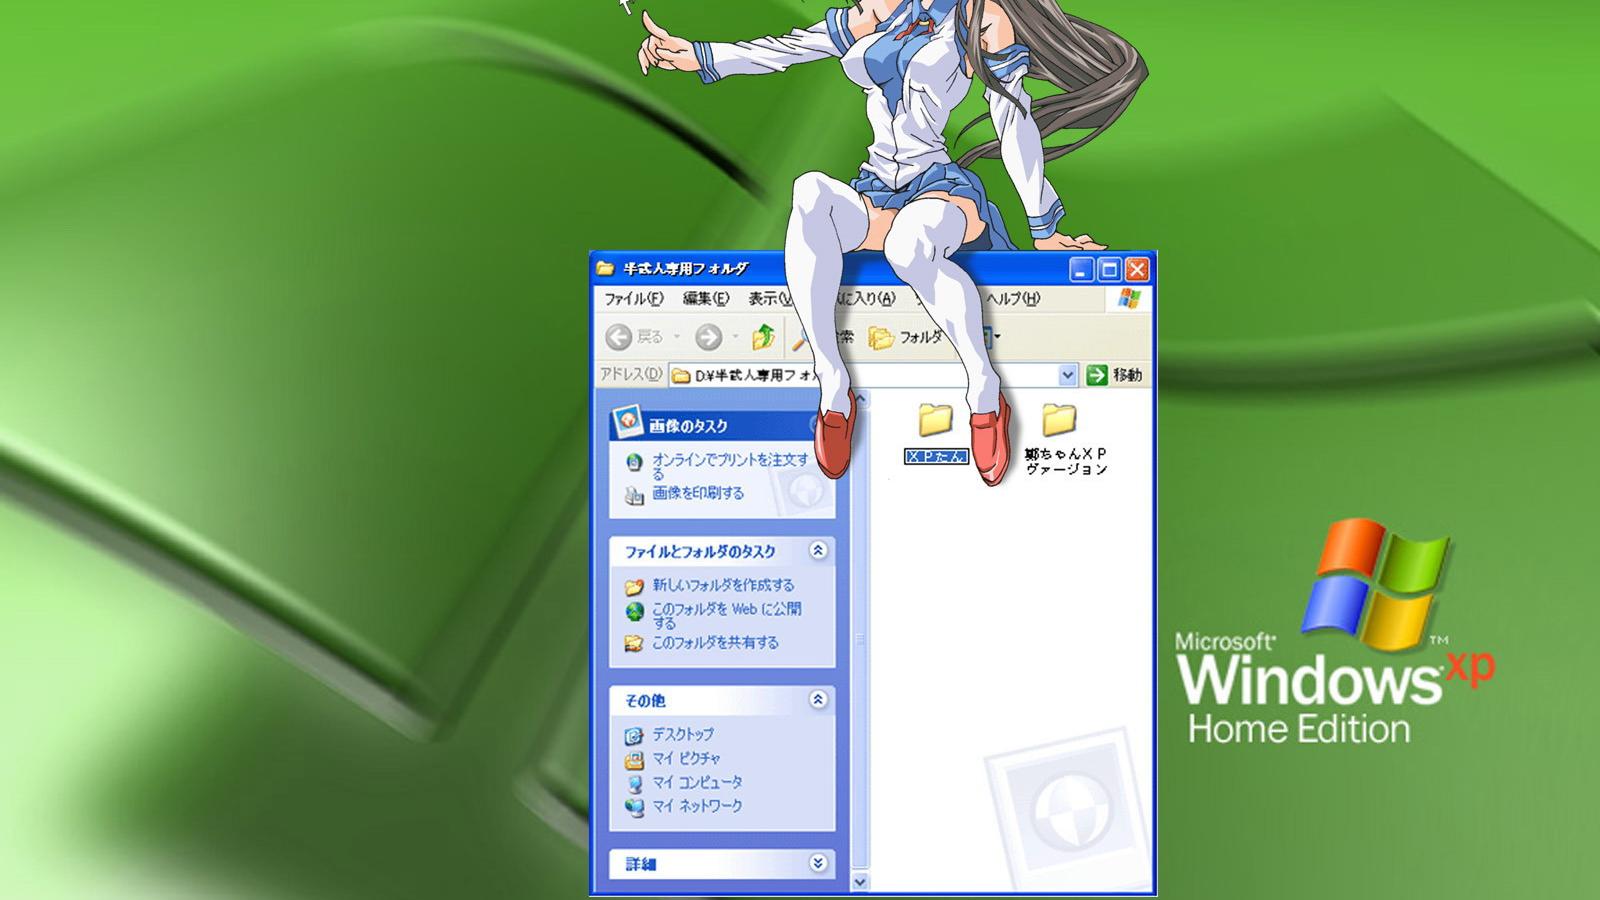 Ever wonder where the windows xp default wallpaper came